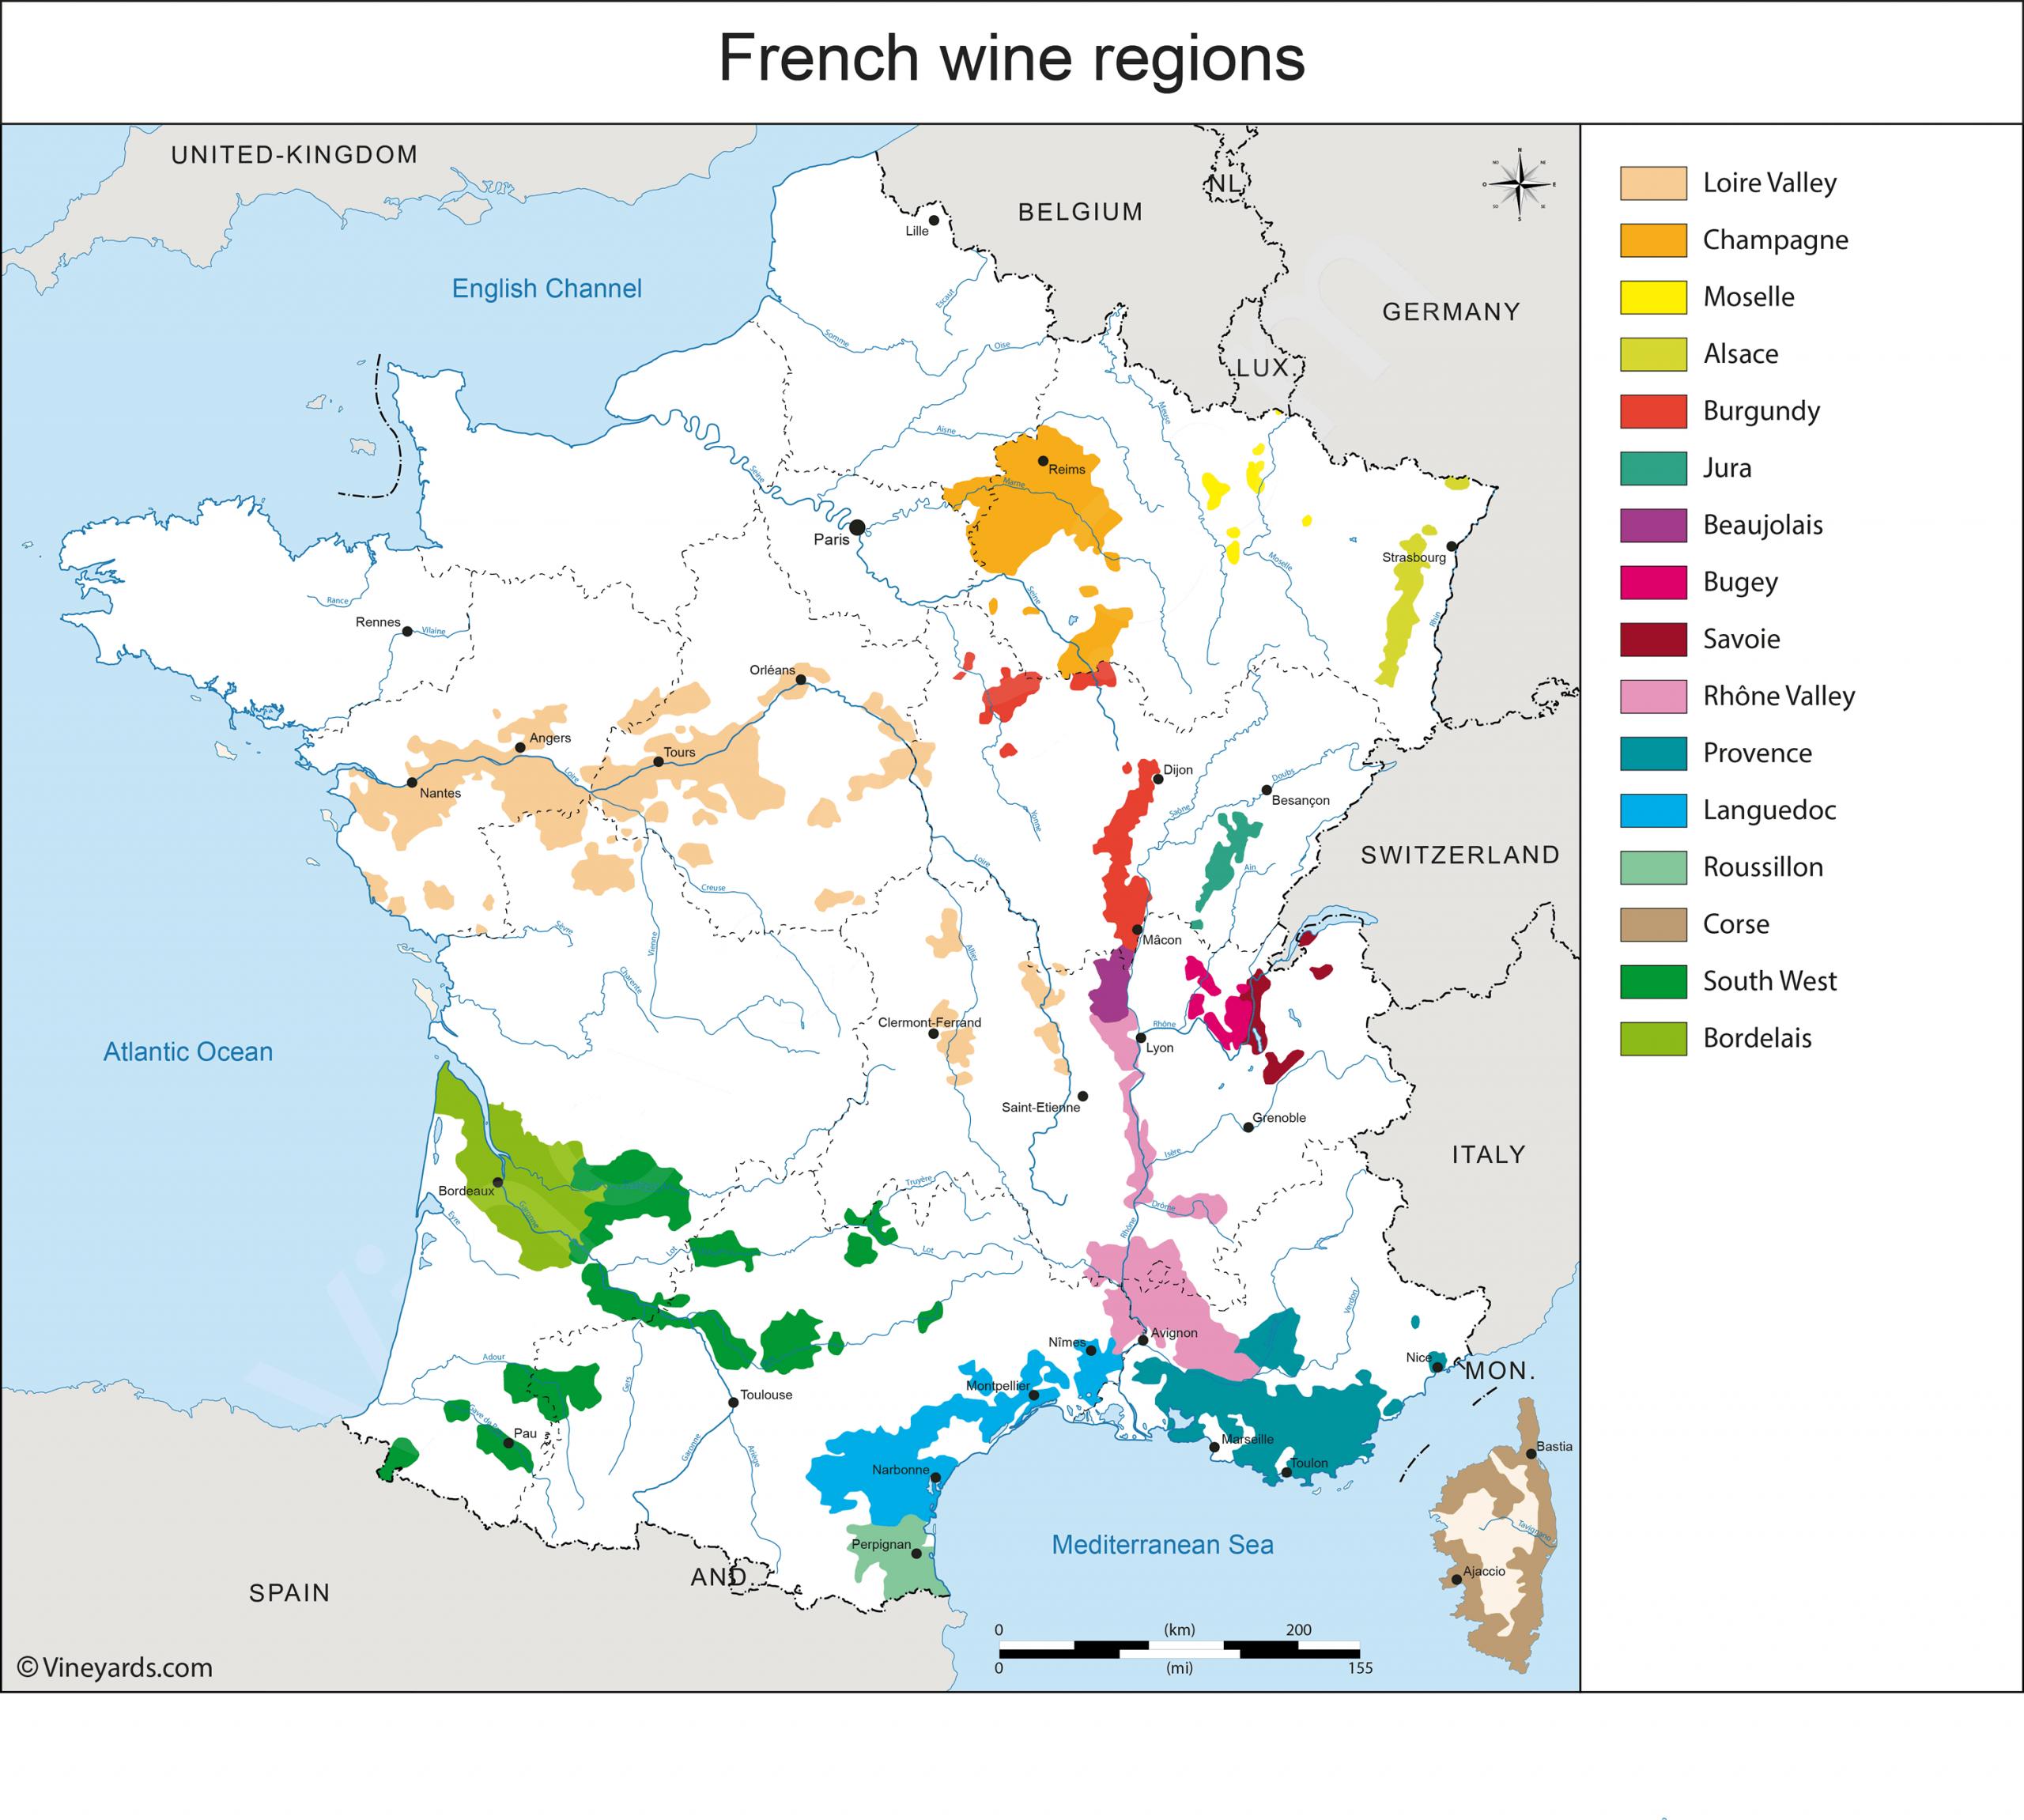 France Map Of Vineyards Wine Regions pour Map De France Regions